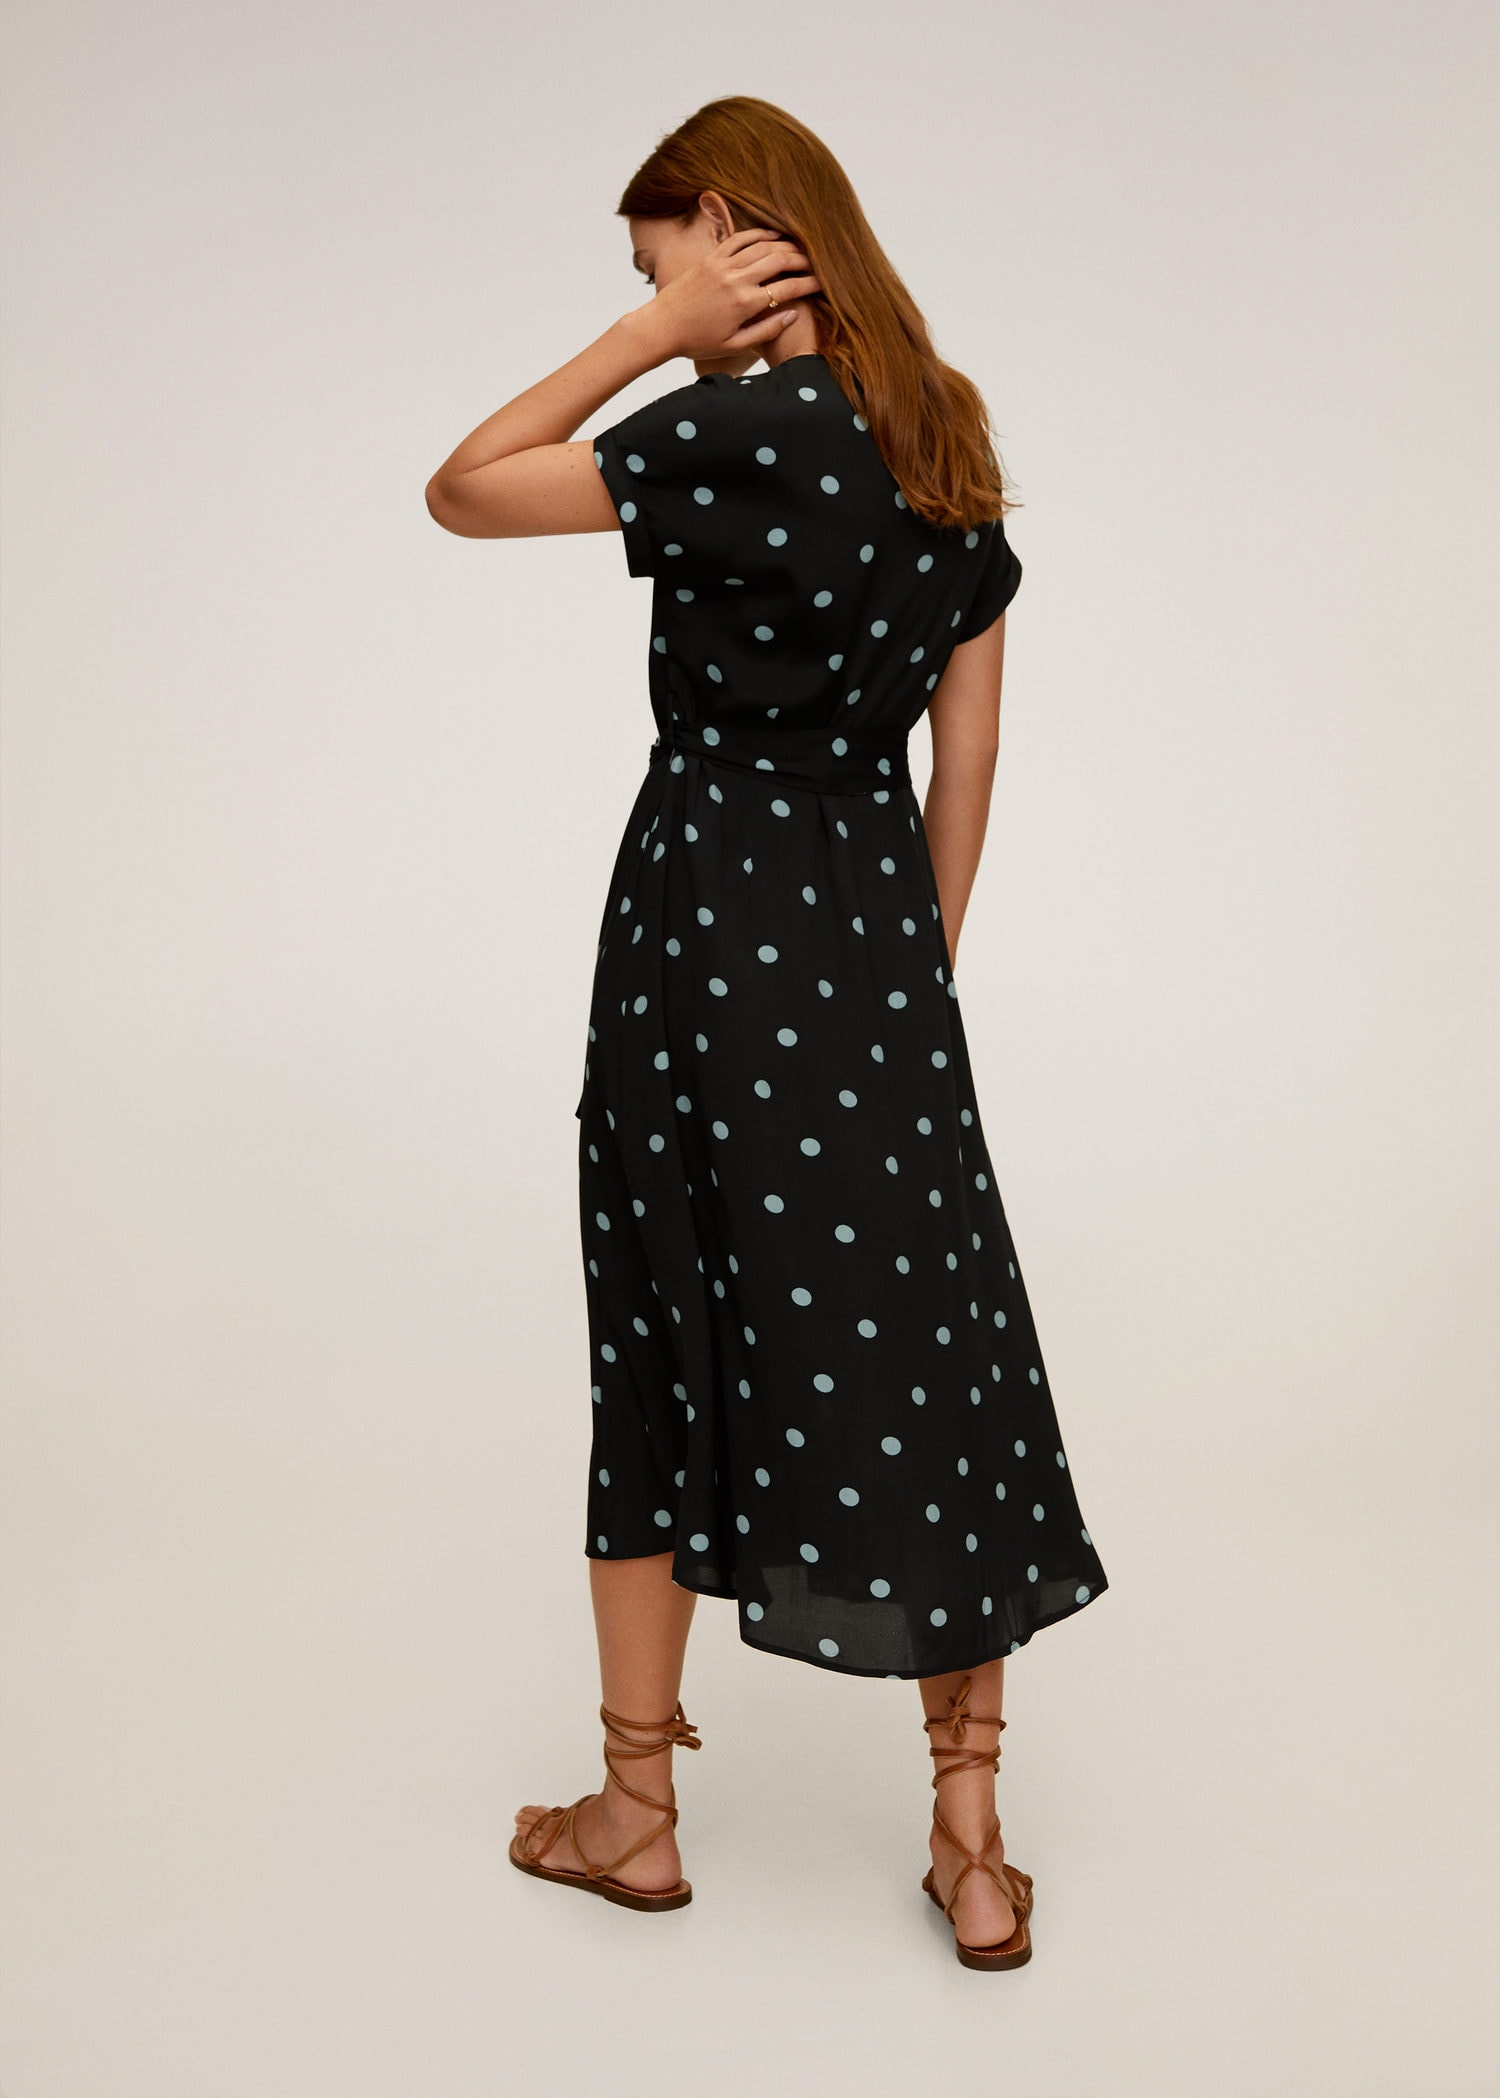 Polka Dot Print Dress Endource